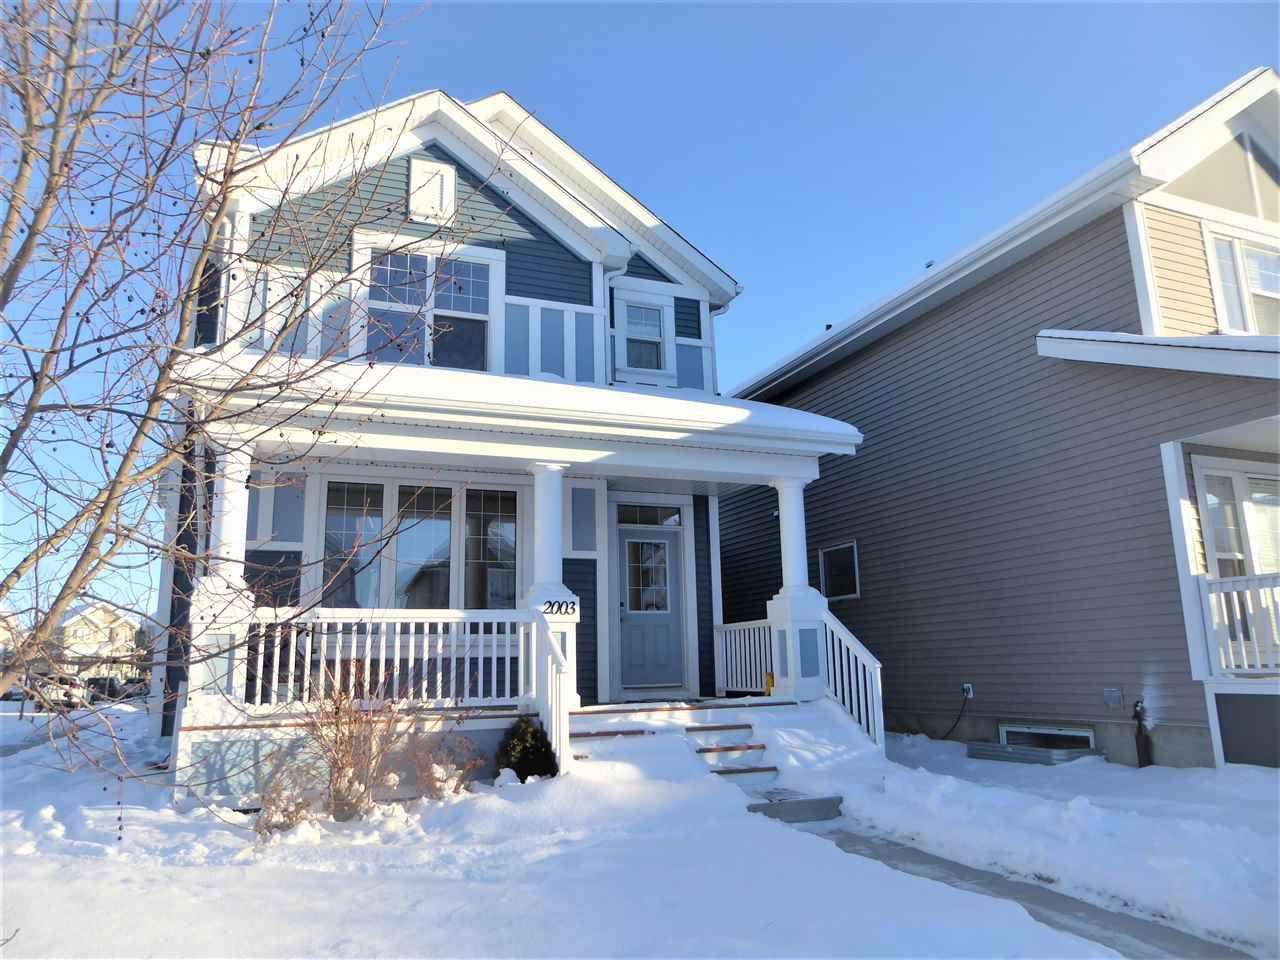 Main Photo: 2003 74 Street SW in Edmonton: Zone 53 House for sale : MLS®# E4138046